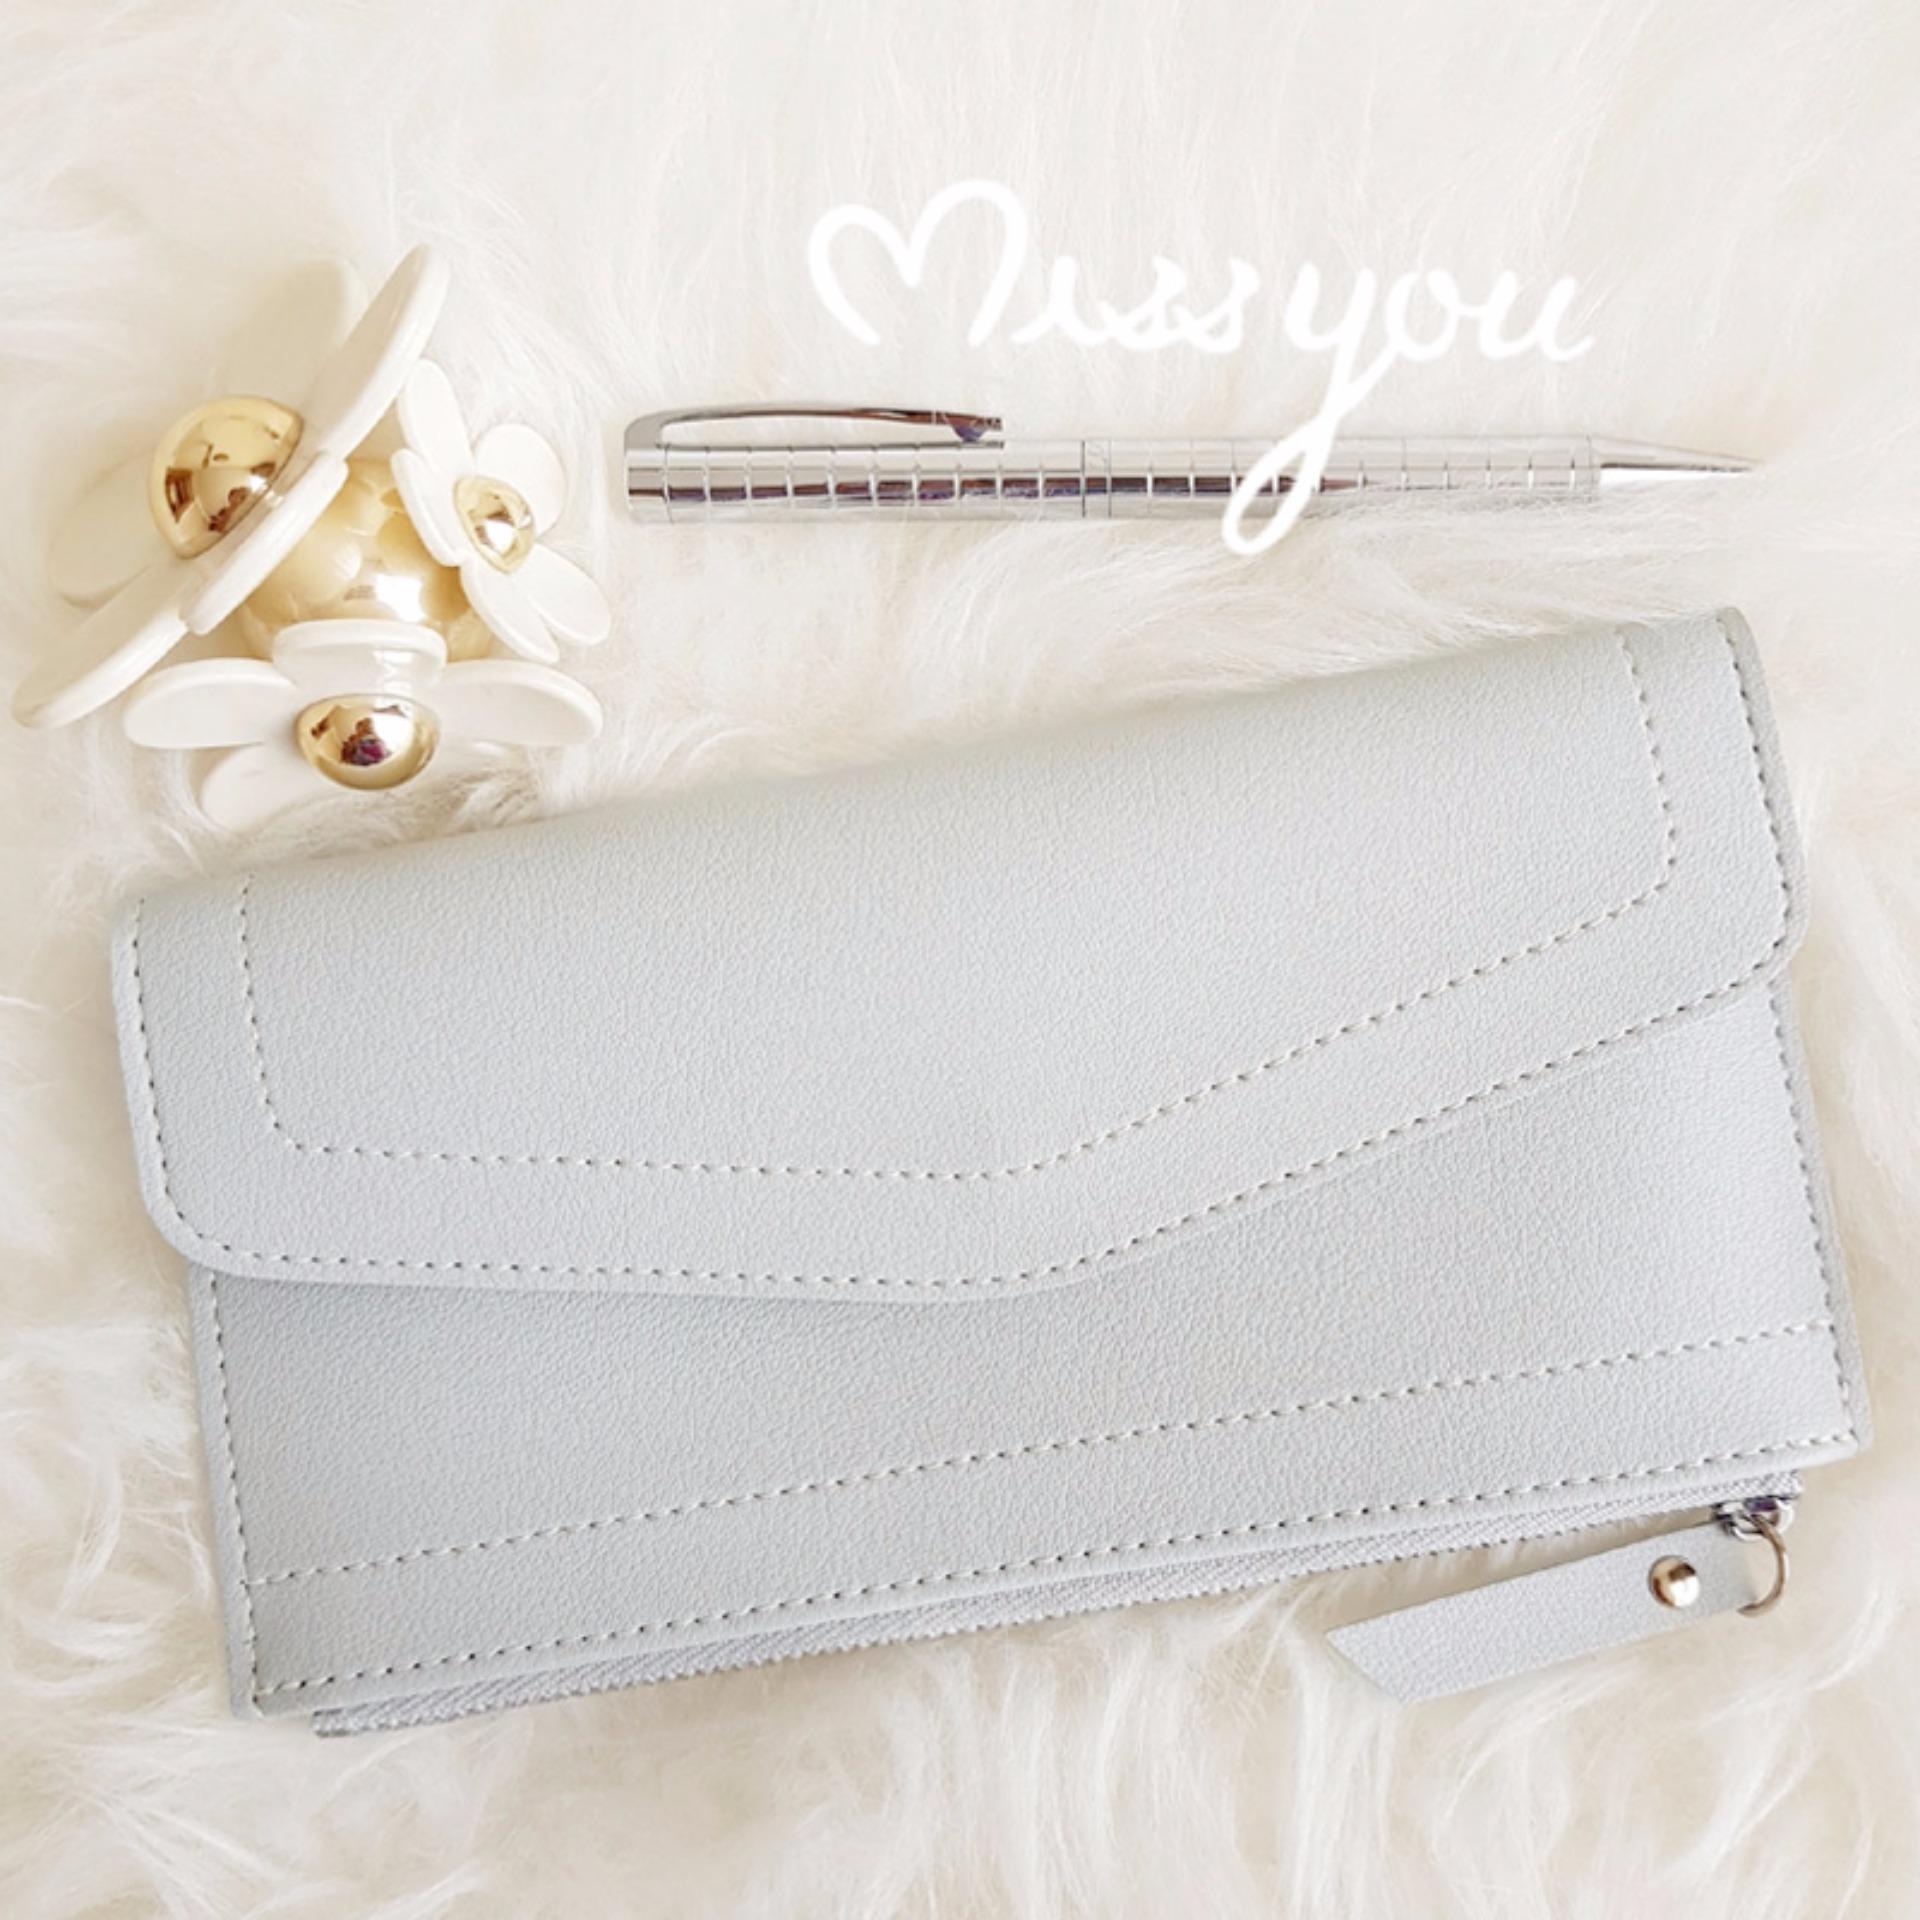 Yadas Korea Aleena Dompet HP Wanita - Soft Grey